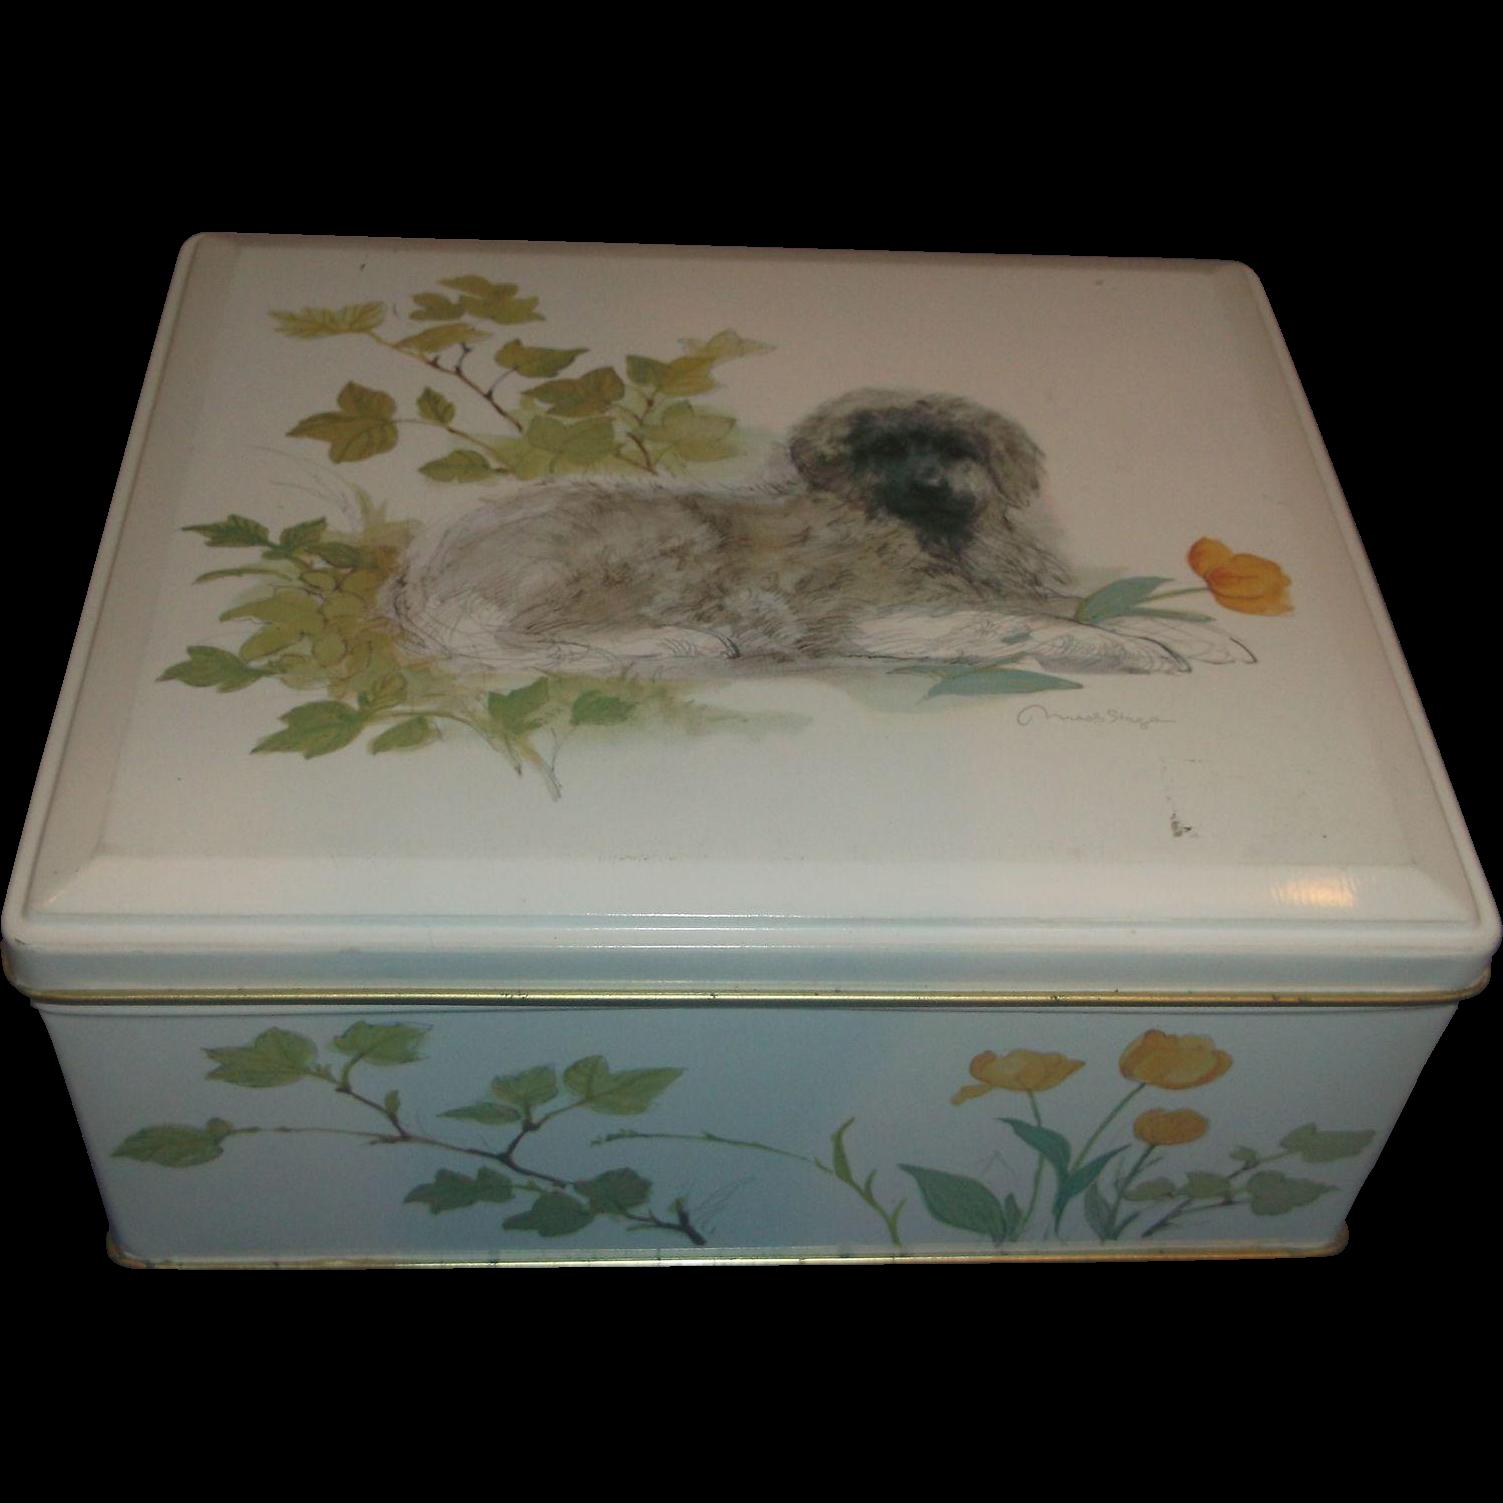 Dog Art Tin Box Hinged Lid Made in England